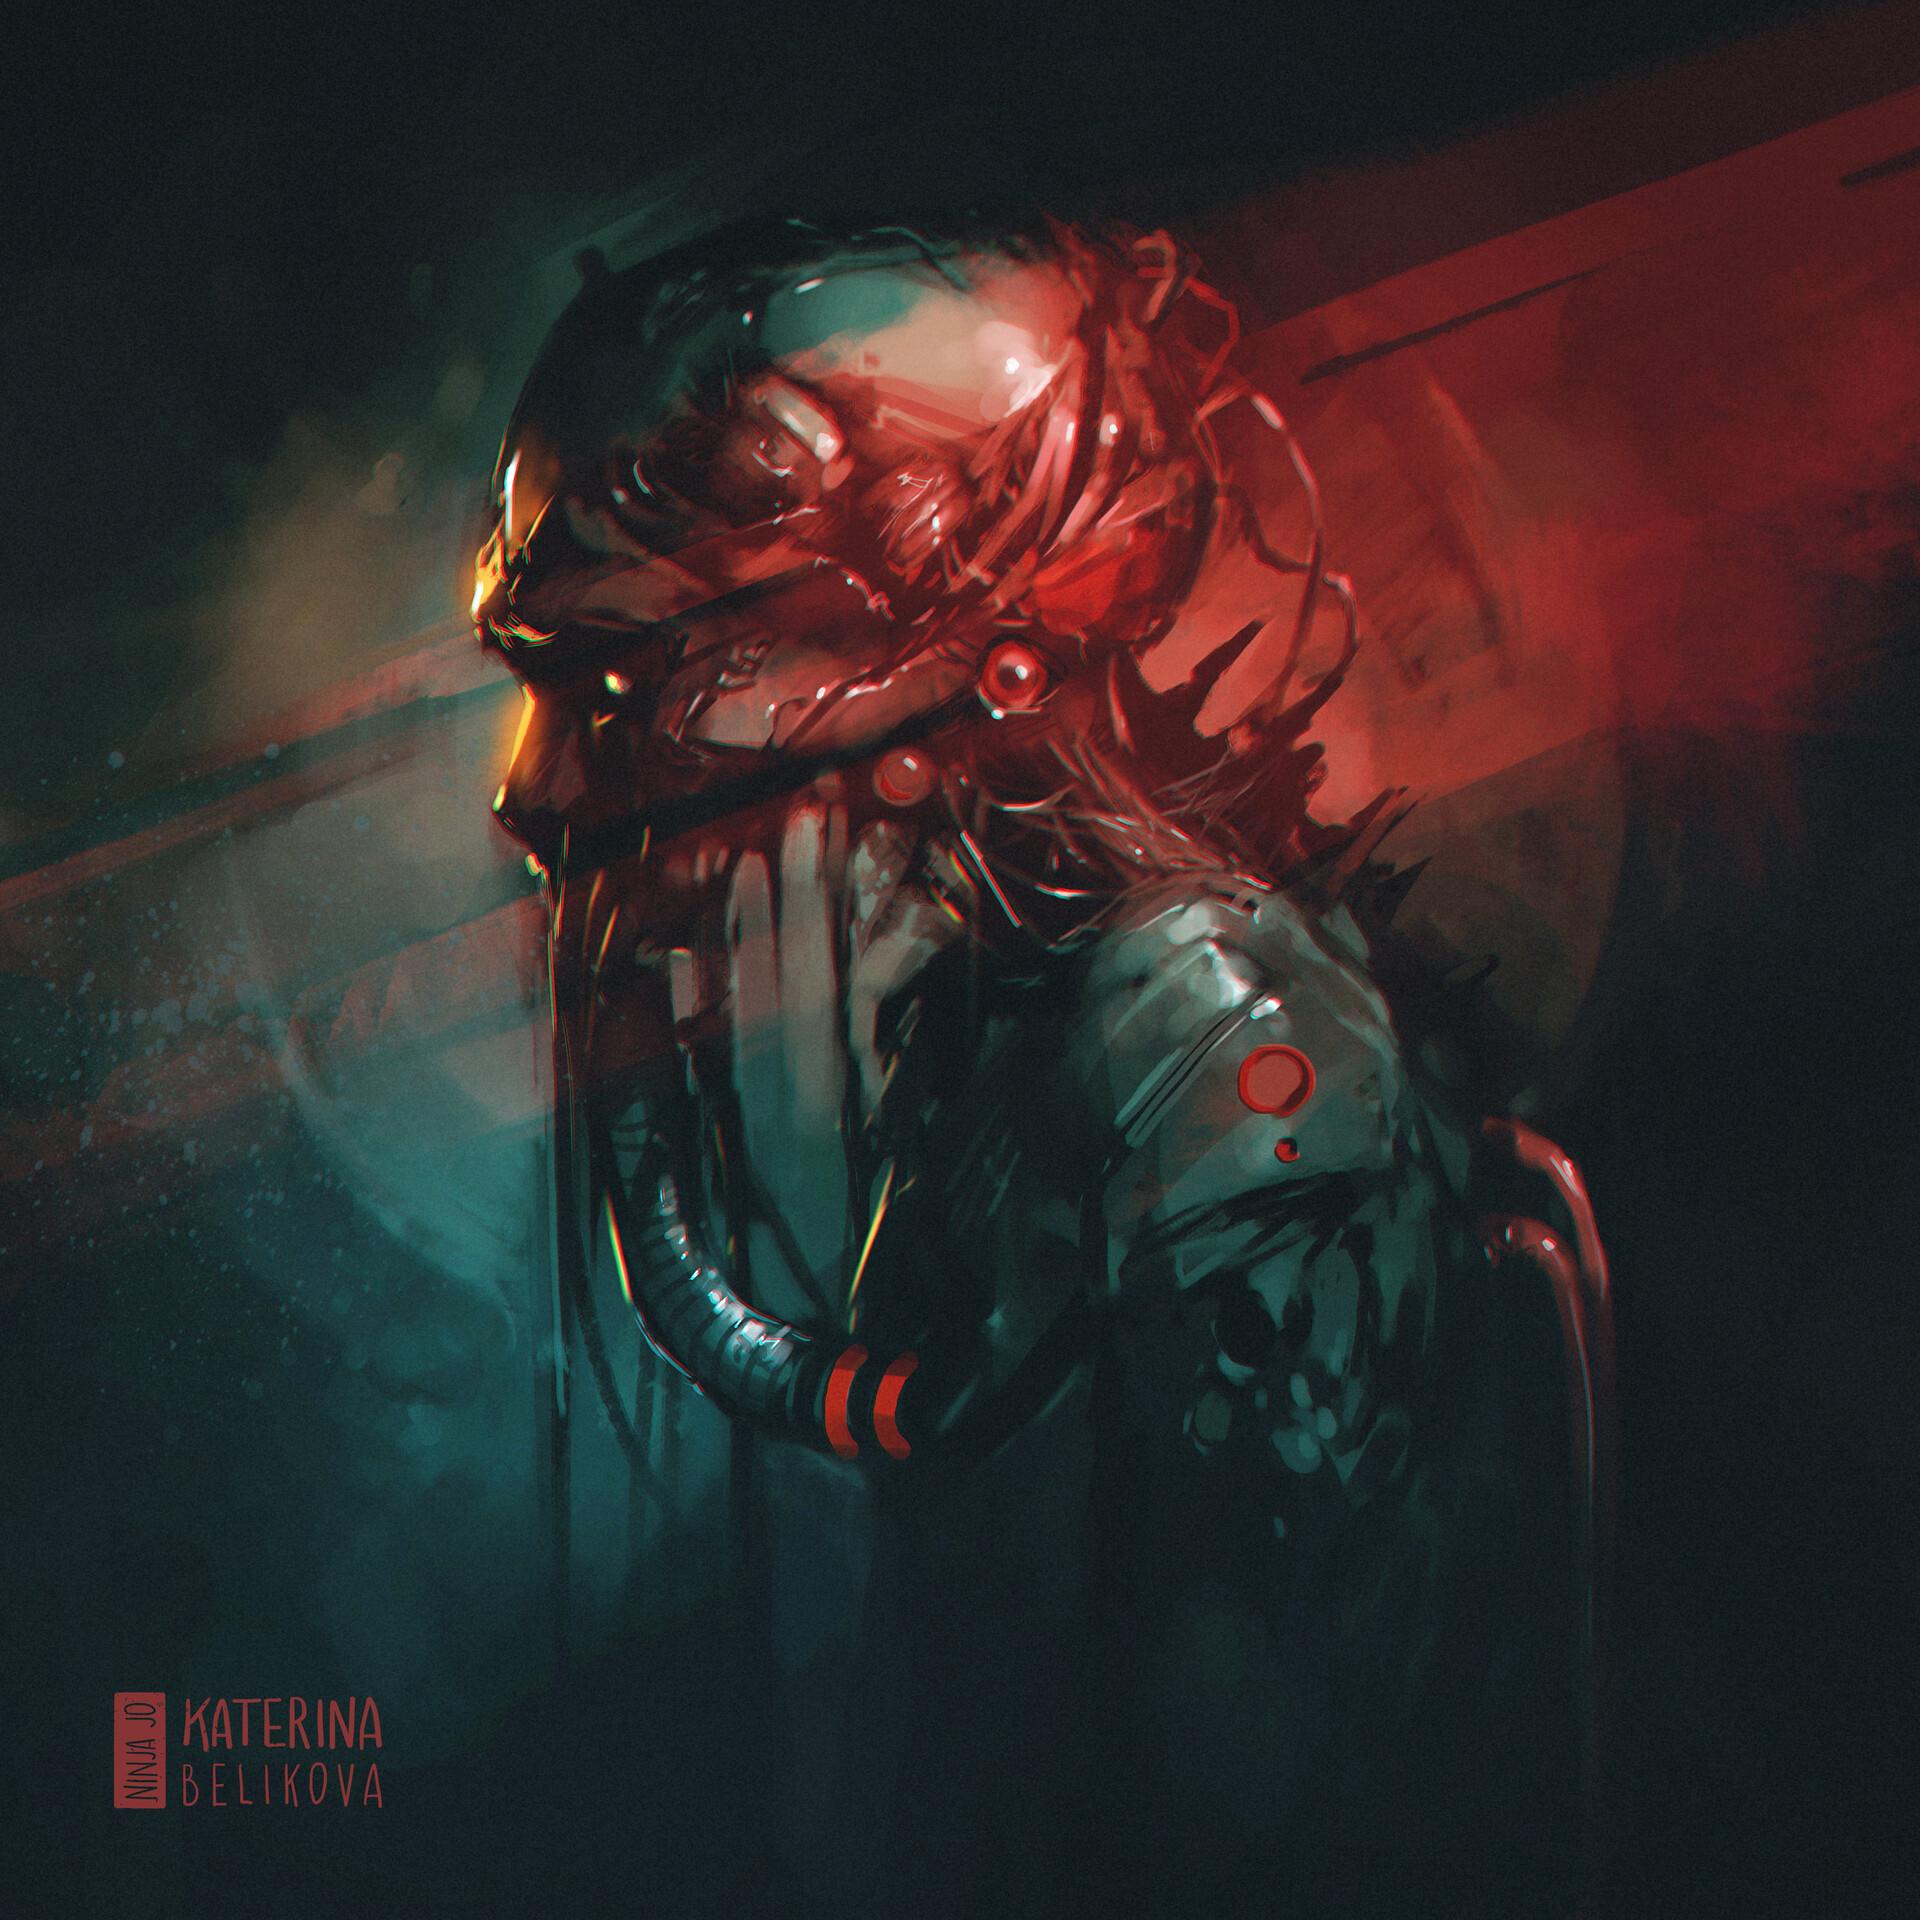 https://cdnb.artstation.com/p/assets/images/images/027/358/267/large/ninja-jo-creepy.jpg